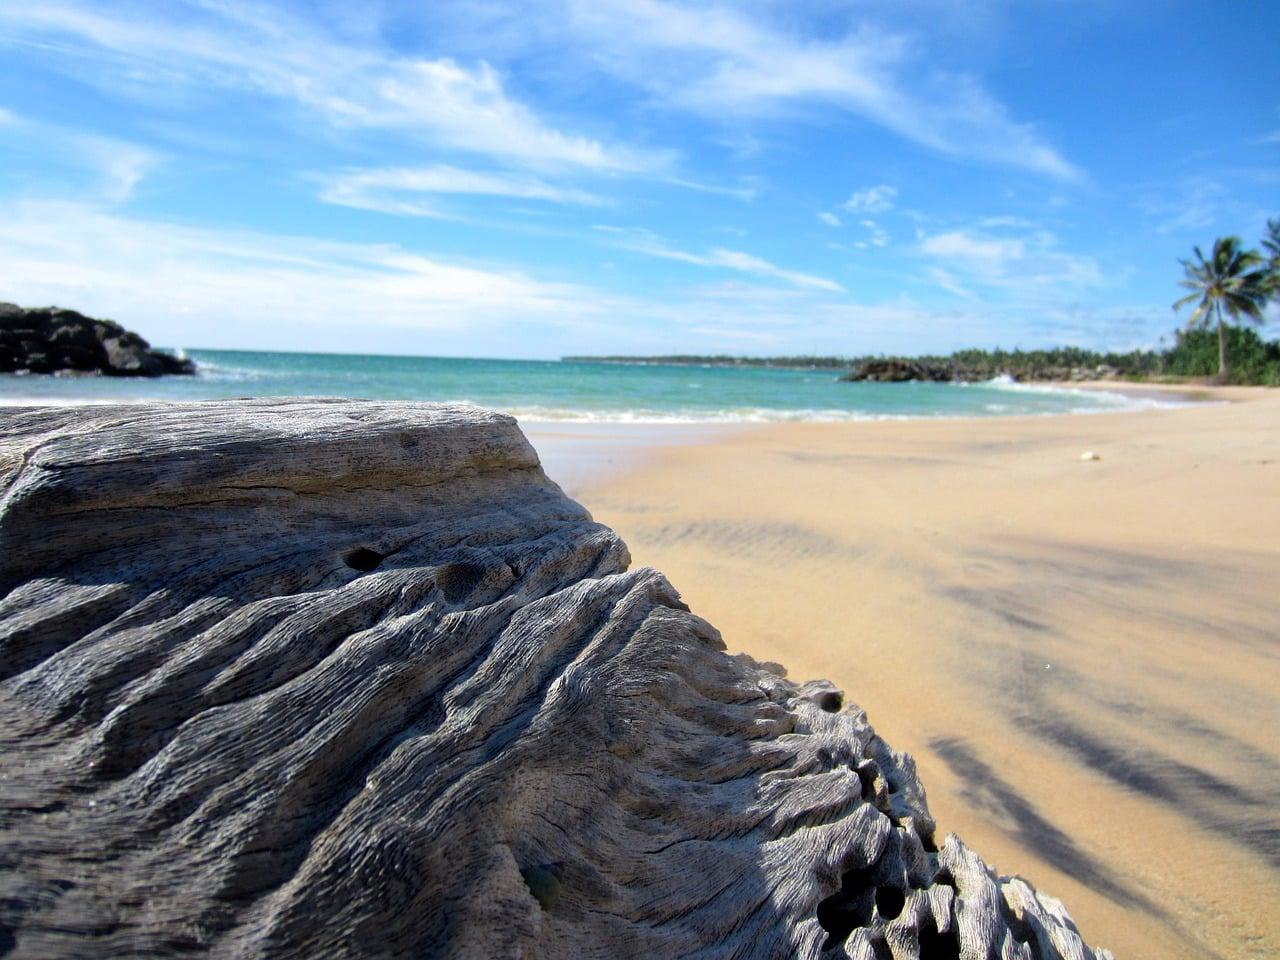 Where to go on holiday - Sri Lanka